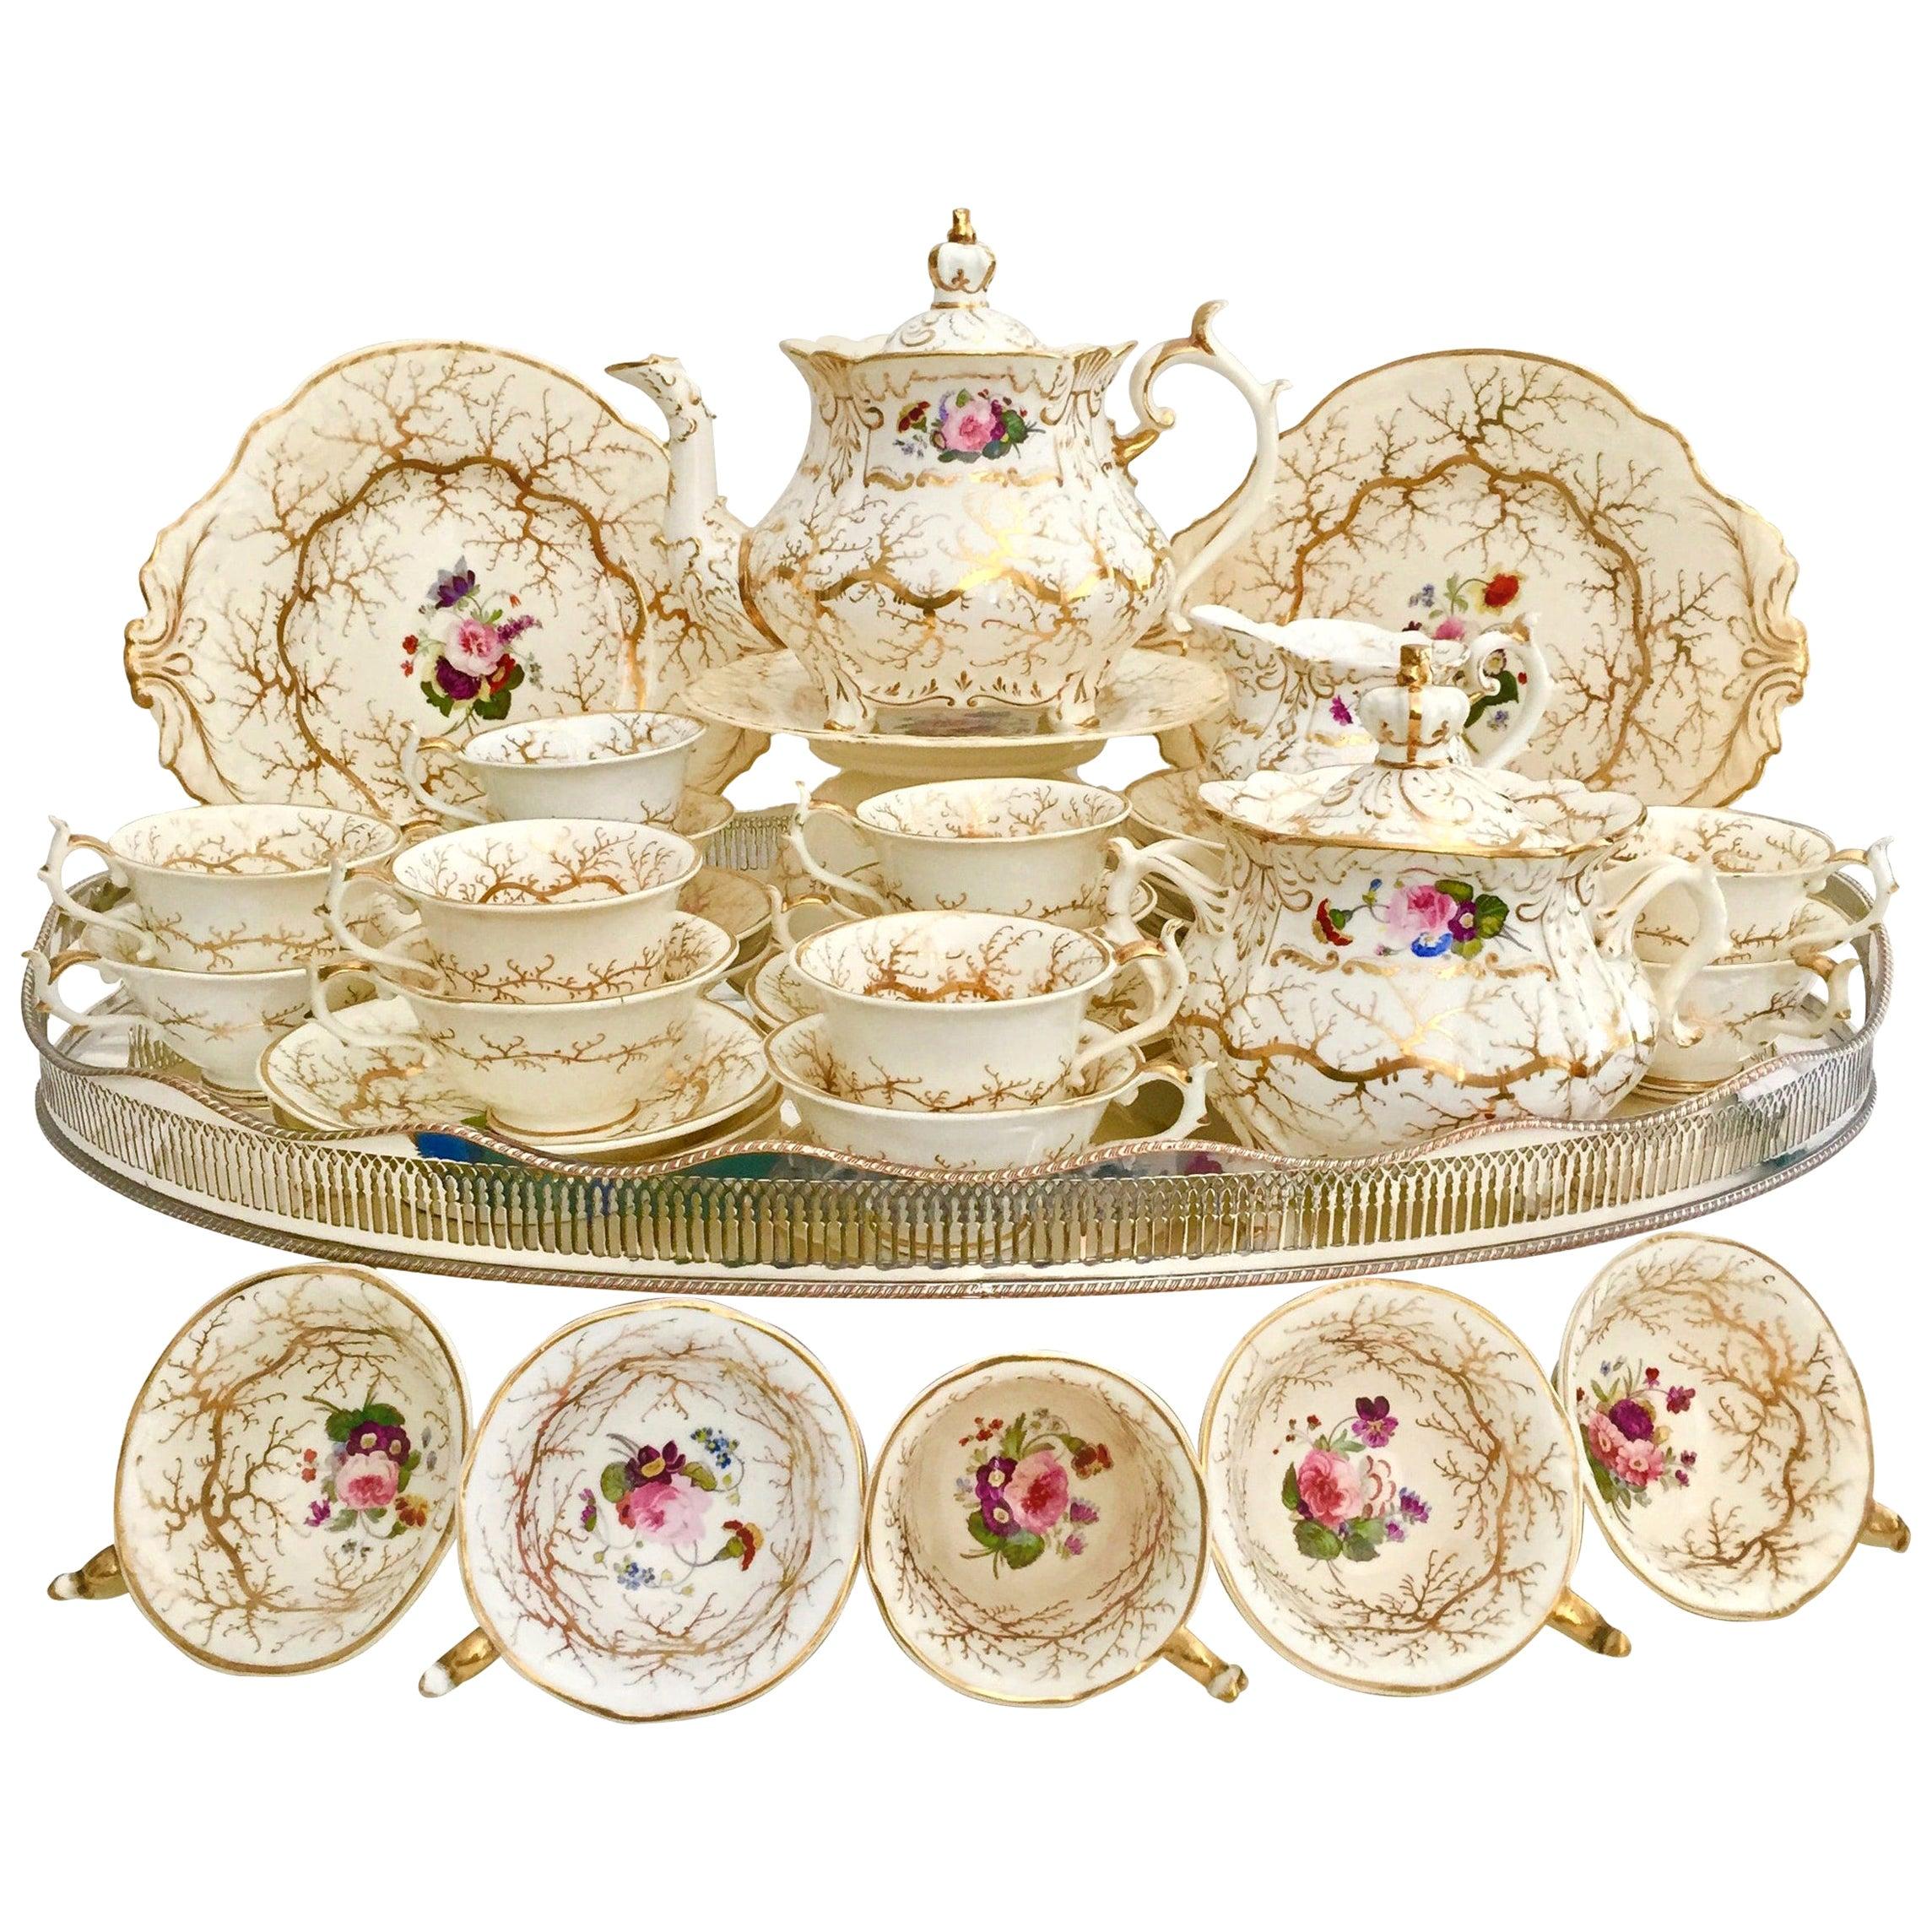 Rockingham Porcelain Tea Service, Cream, Gilt and Flowers, Rococo Revival, 1832